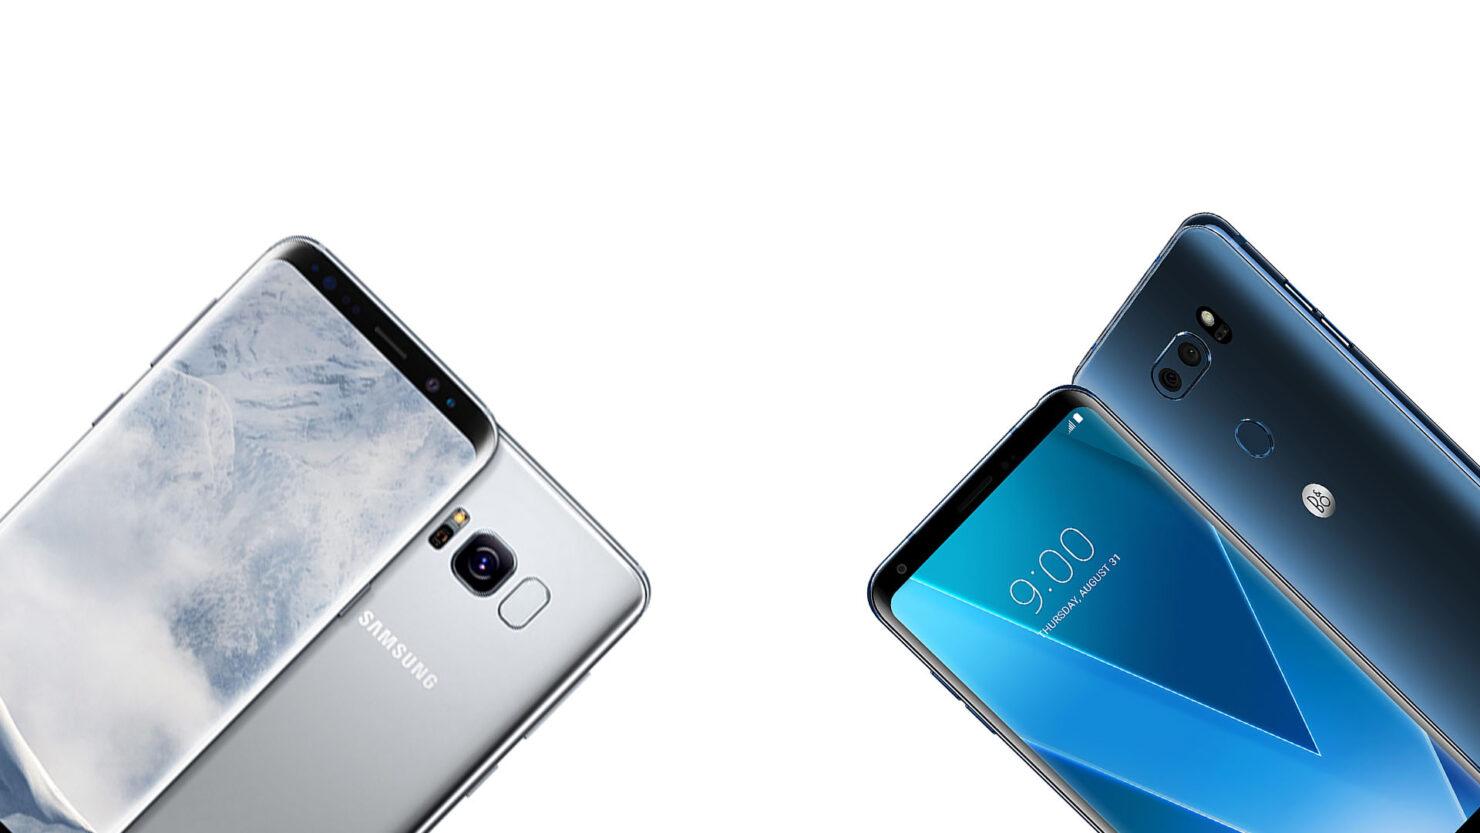 Galaxy S9 LG G7 January 2018 launch